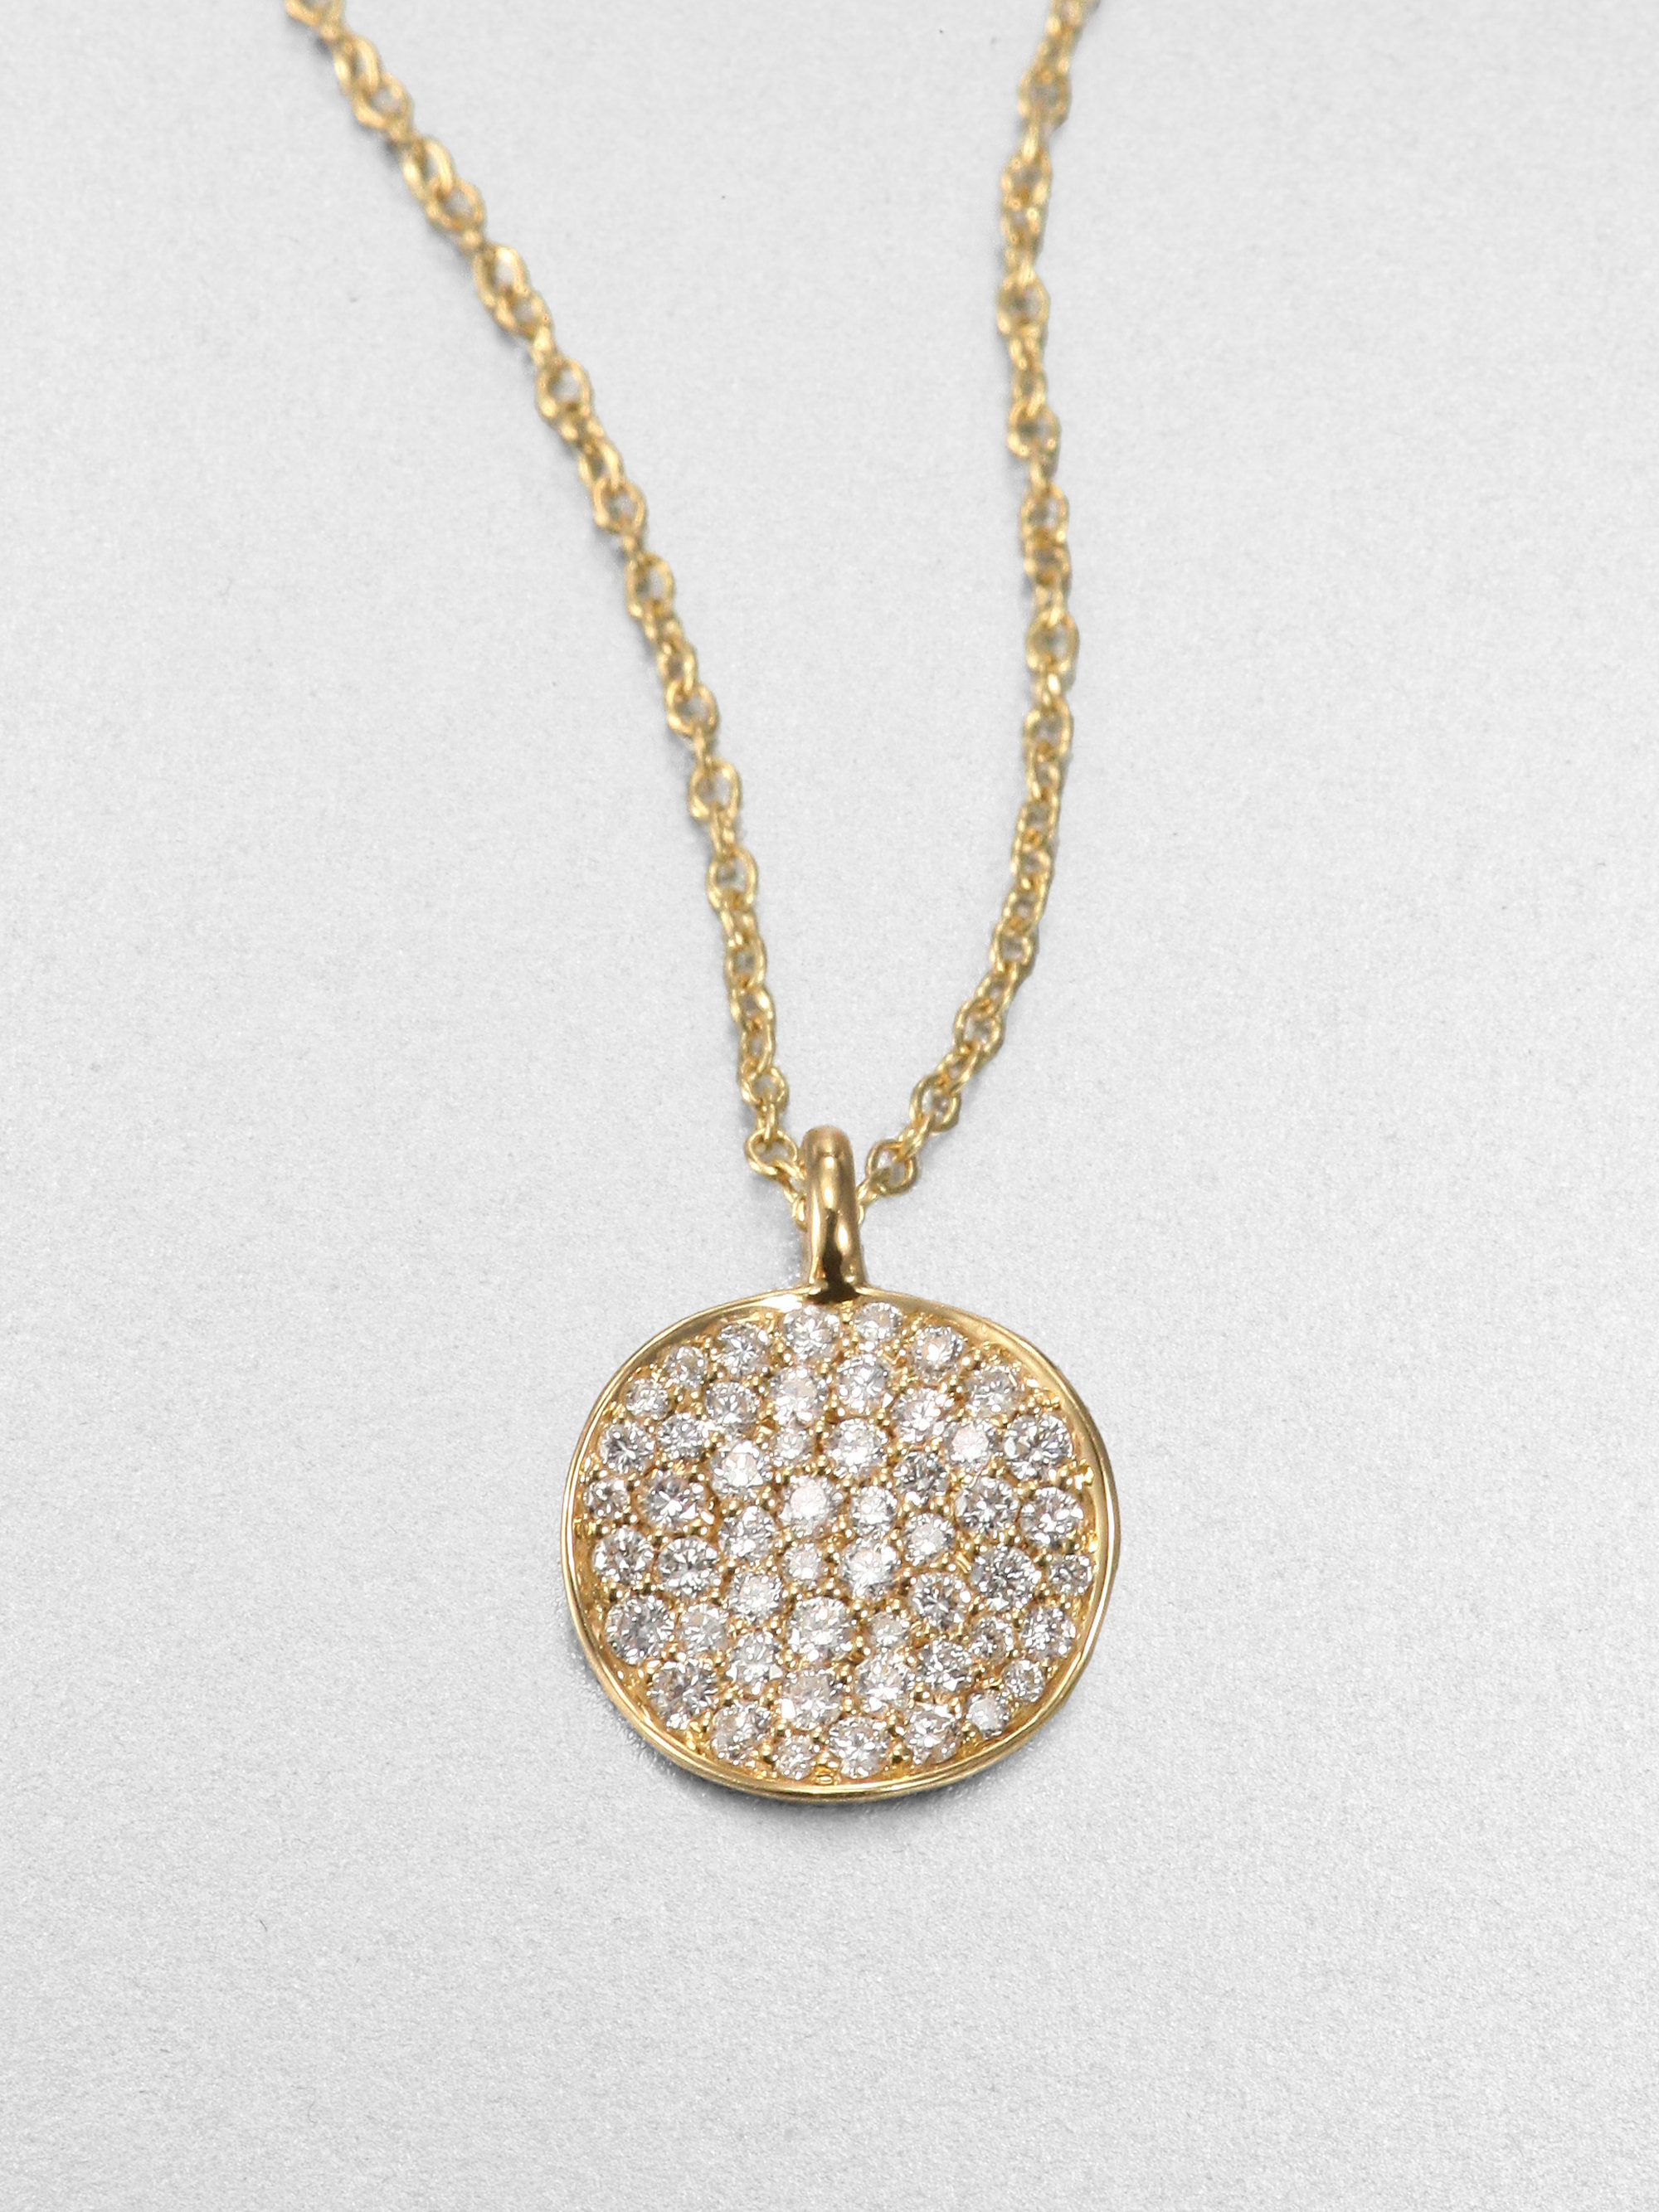 ippolita stardust 18k yellow gold disc pendant